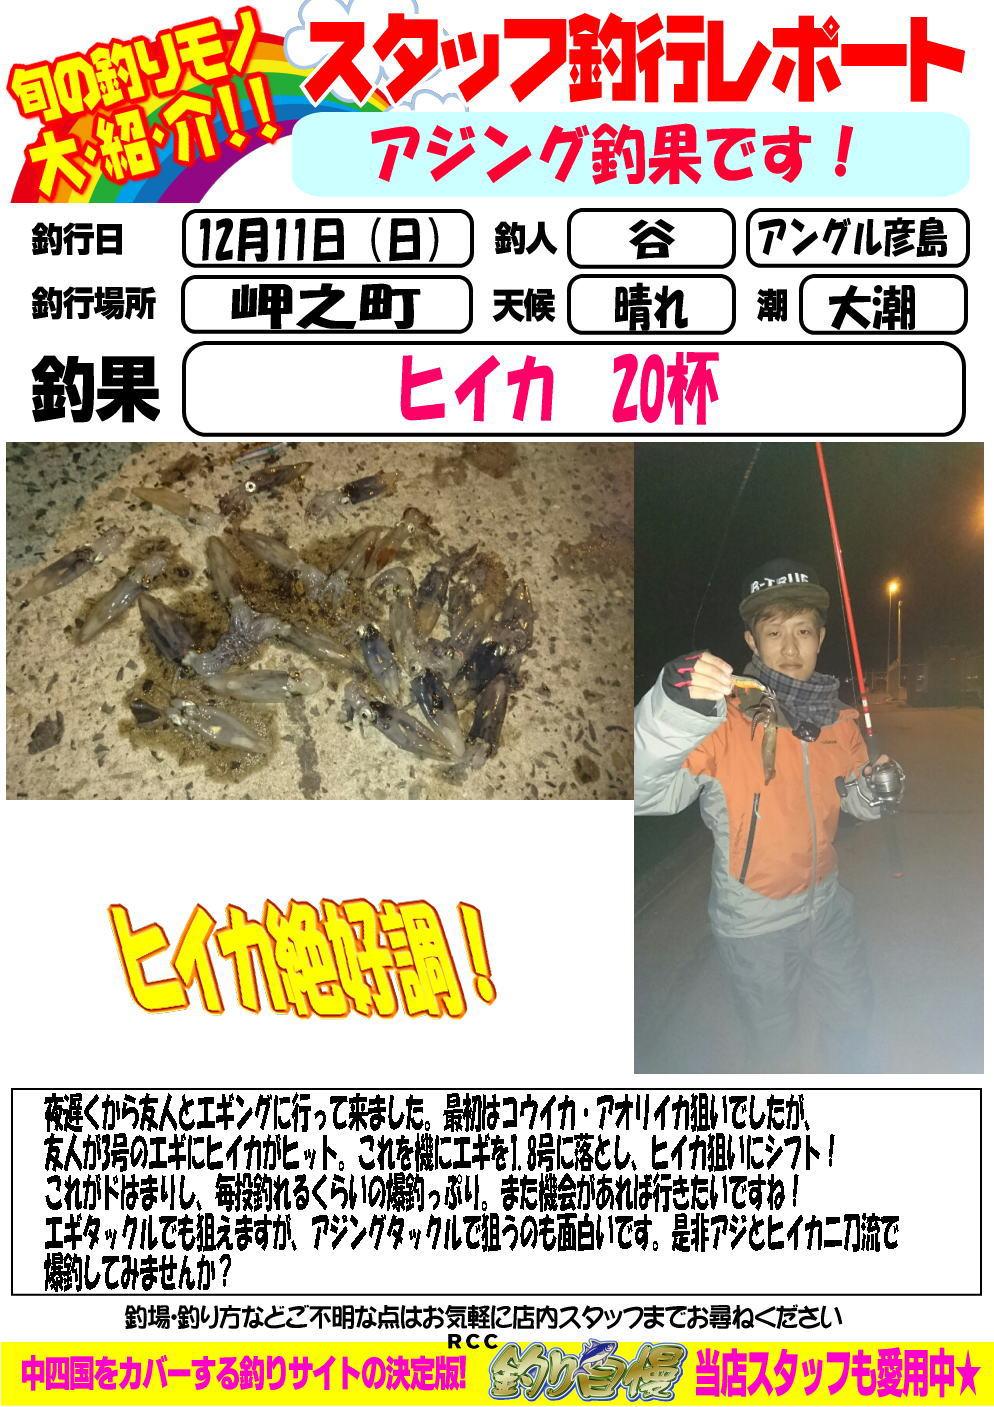 http://www.e-angle.co.jp/shop/blog/blog-20161211-hikoshima-hiika.jpg